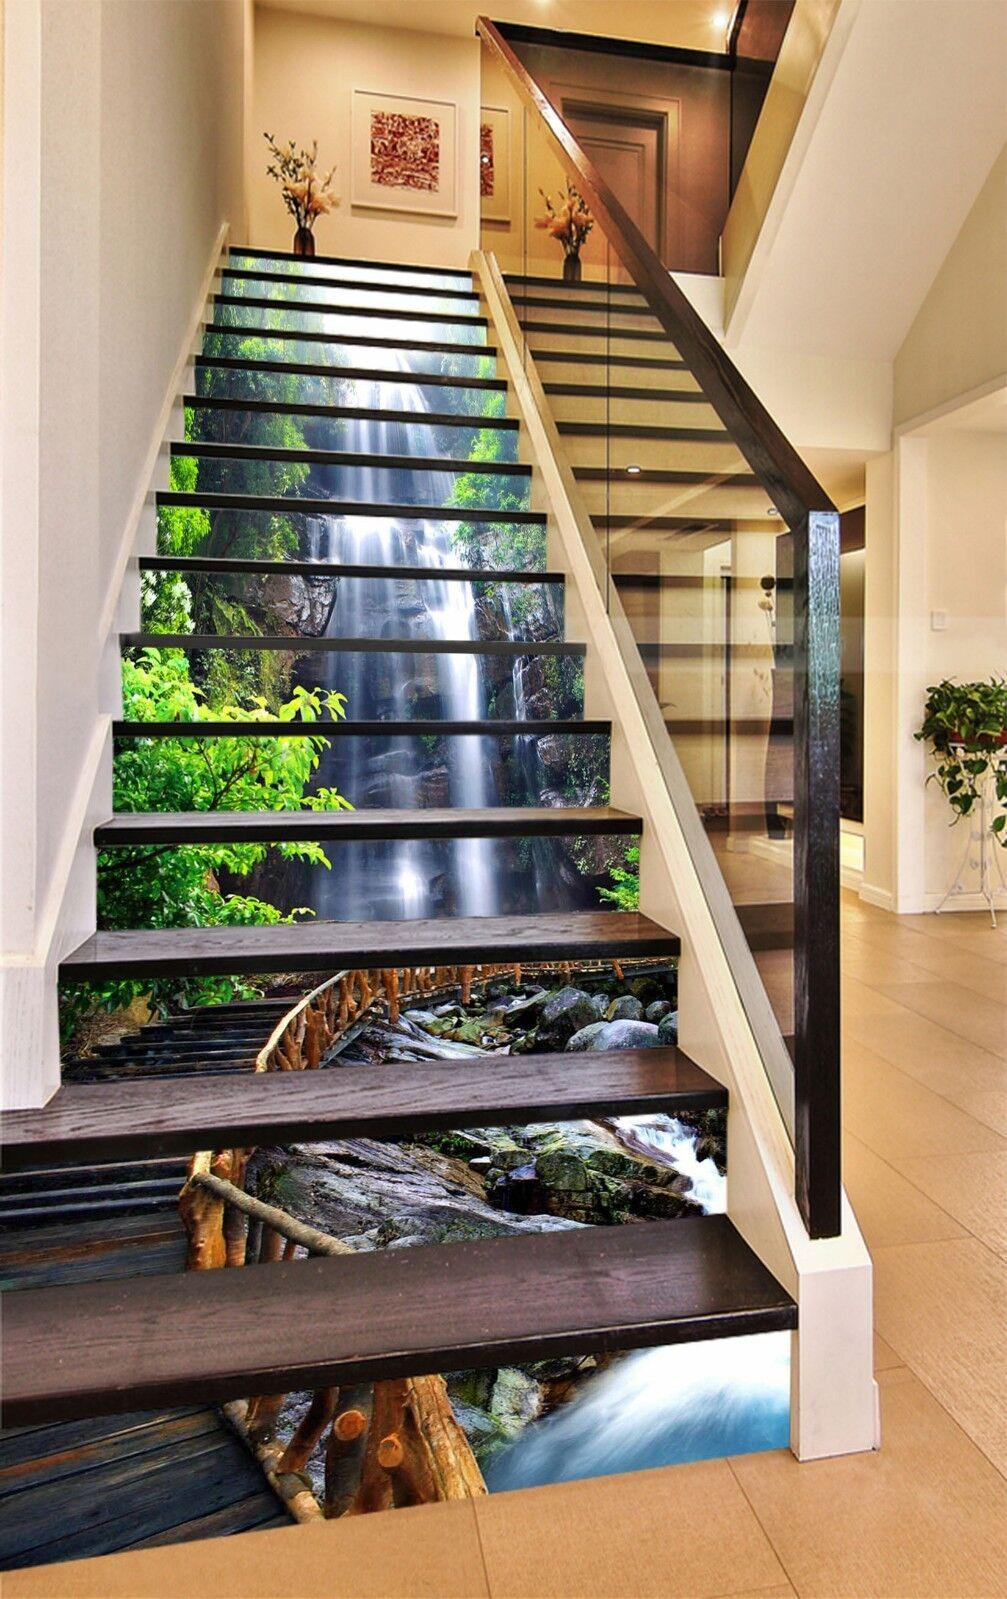 3D Stream Bridge 3 Stair Risers Decoration Photo Mural Vinyl Decal Wallpaper CA